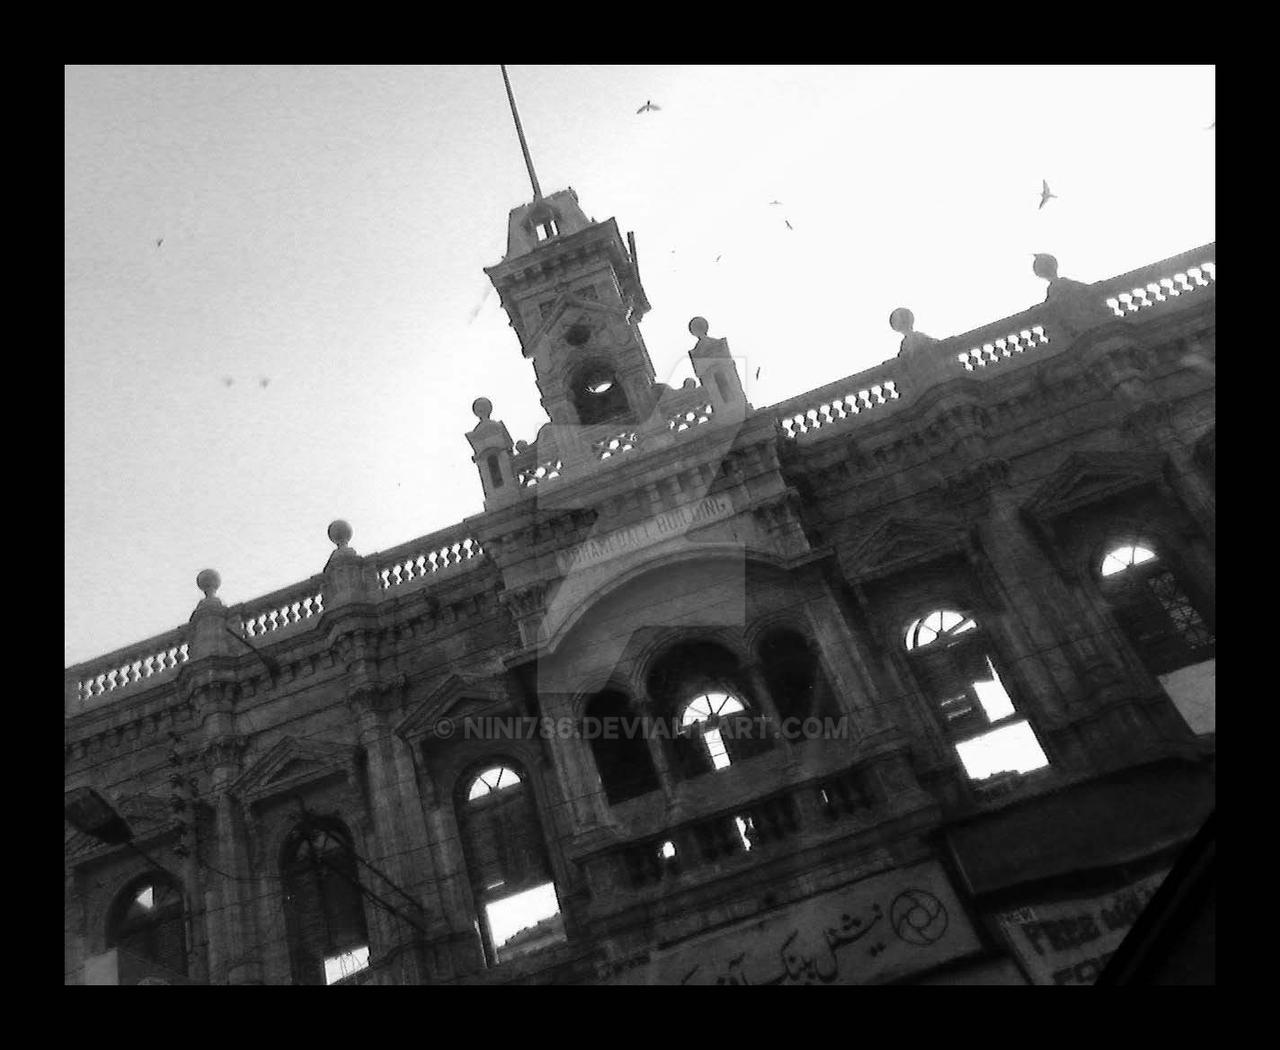 Old Karachi by nini786 on DeviantArt